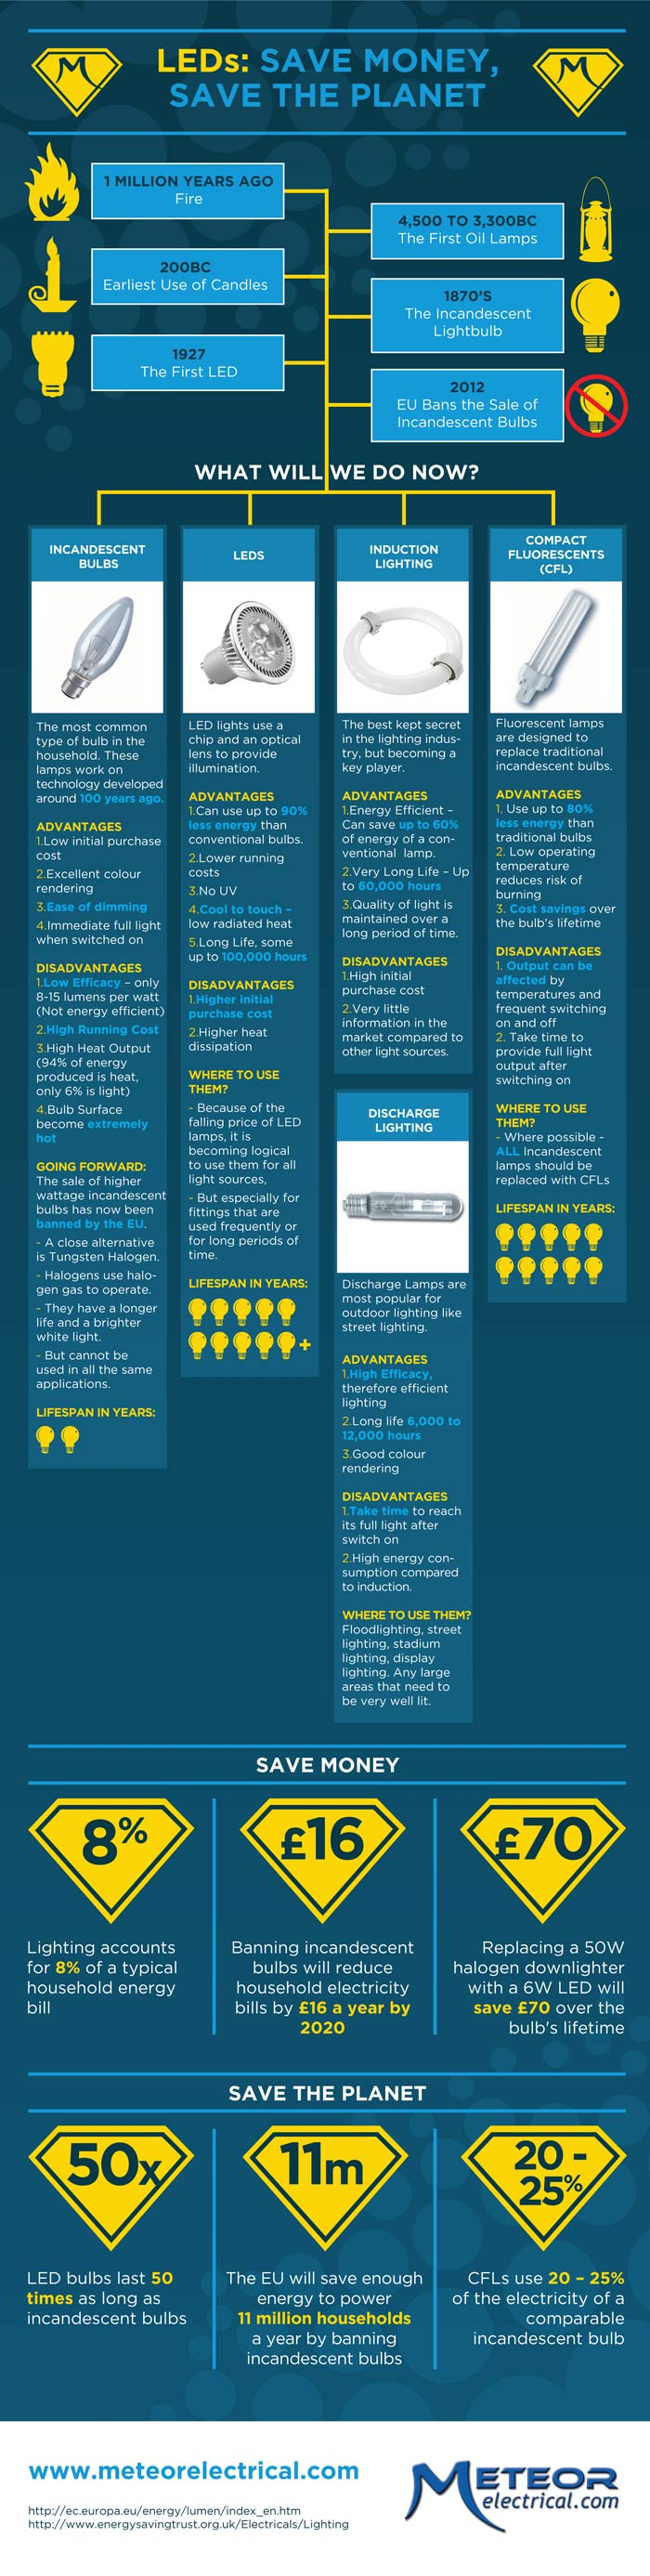 LED Savings Infographic